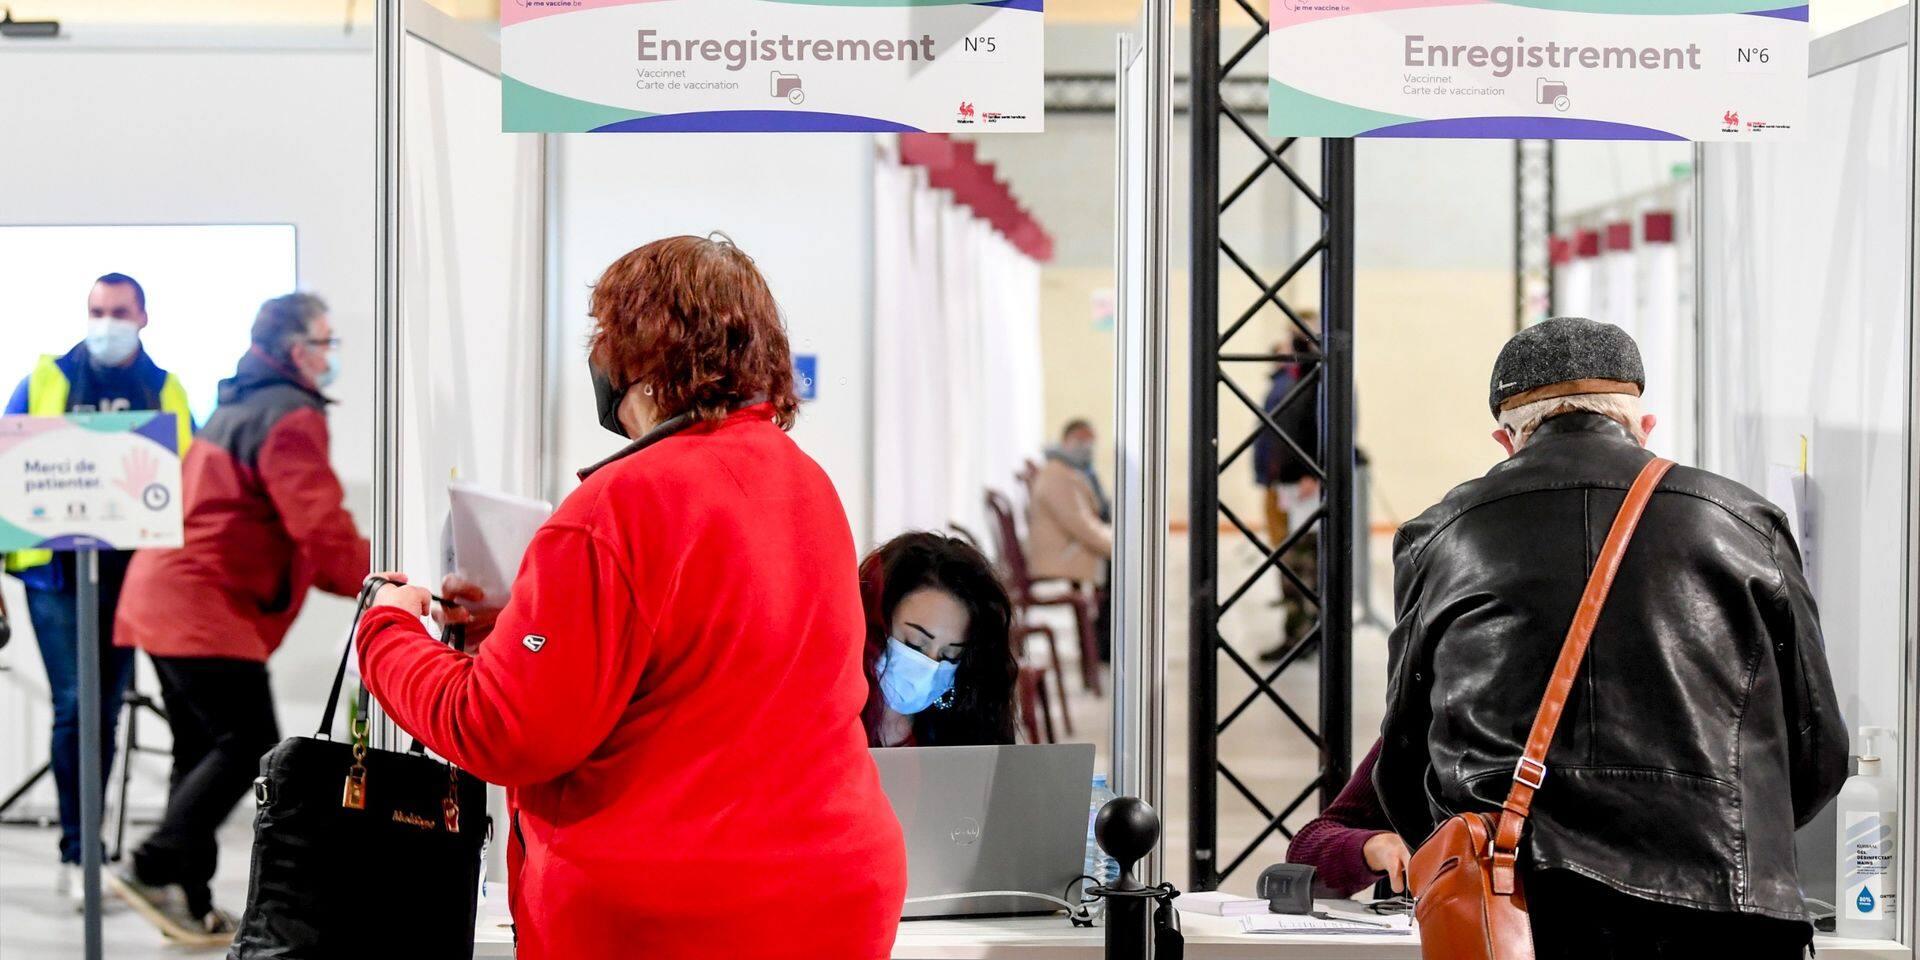 La Wallonie crée 75 lignes de vaccination supplémentaires